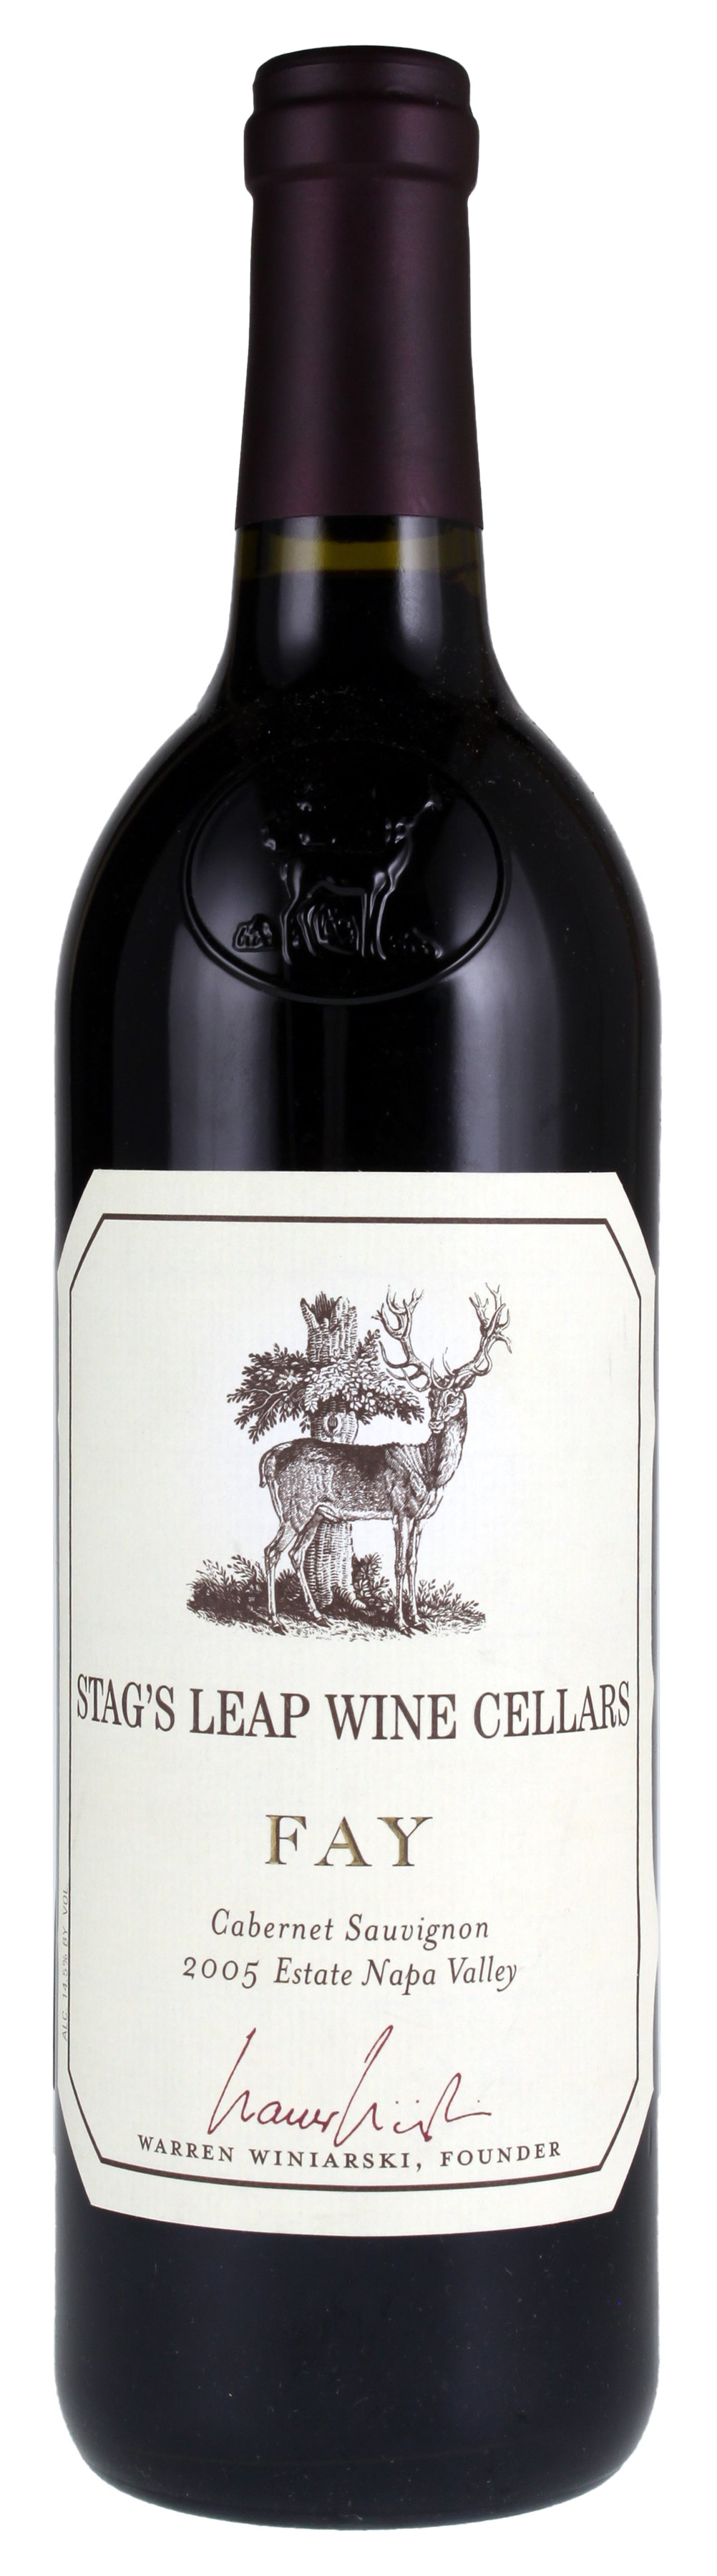 /BuyWine/Item/Auction/174136/2005-Stags-Leap-Wine-Cellars -Fay-Vineyard-Cabernet~  sc 1 st  WineBid & Stagu0027s Leap Wine Cellars Fay Vineyard Cabernet Sauvignon 2005 Red ...